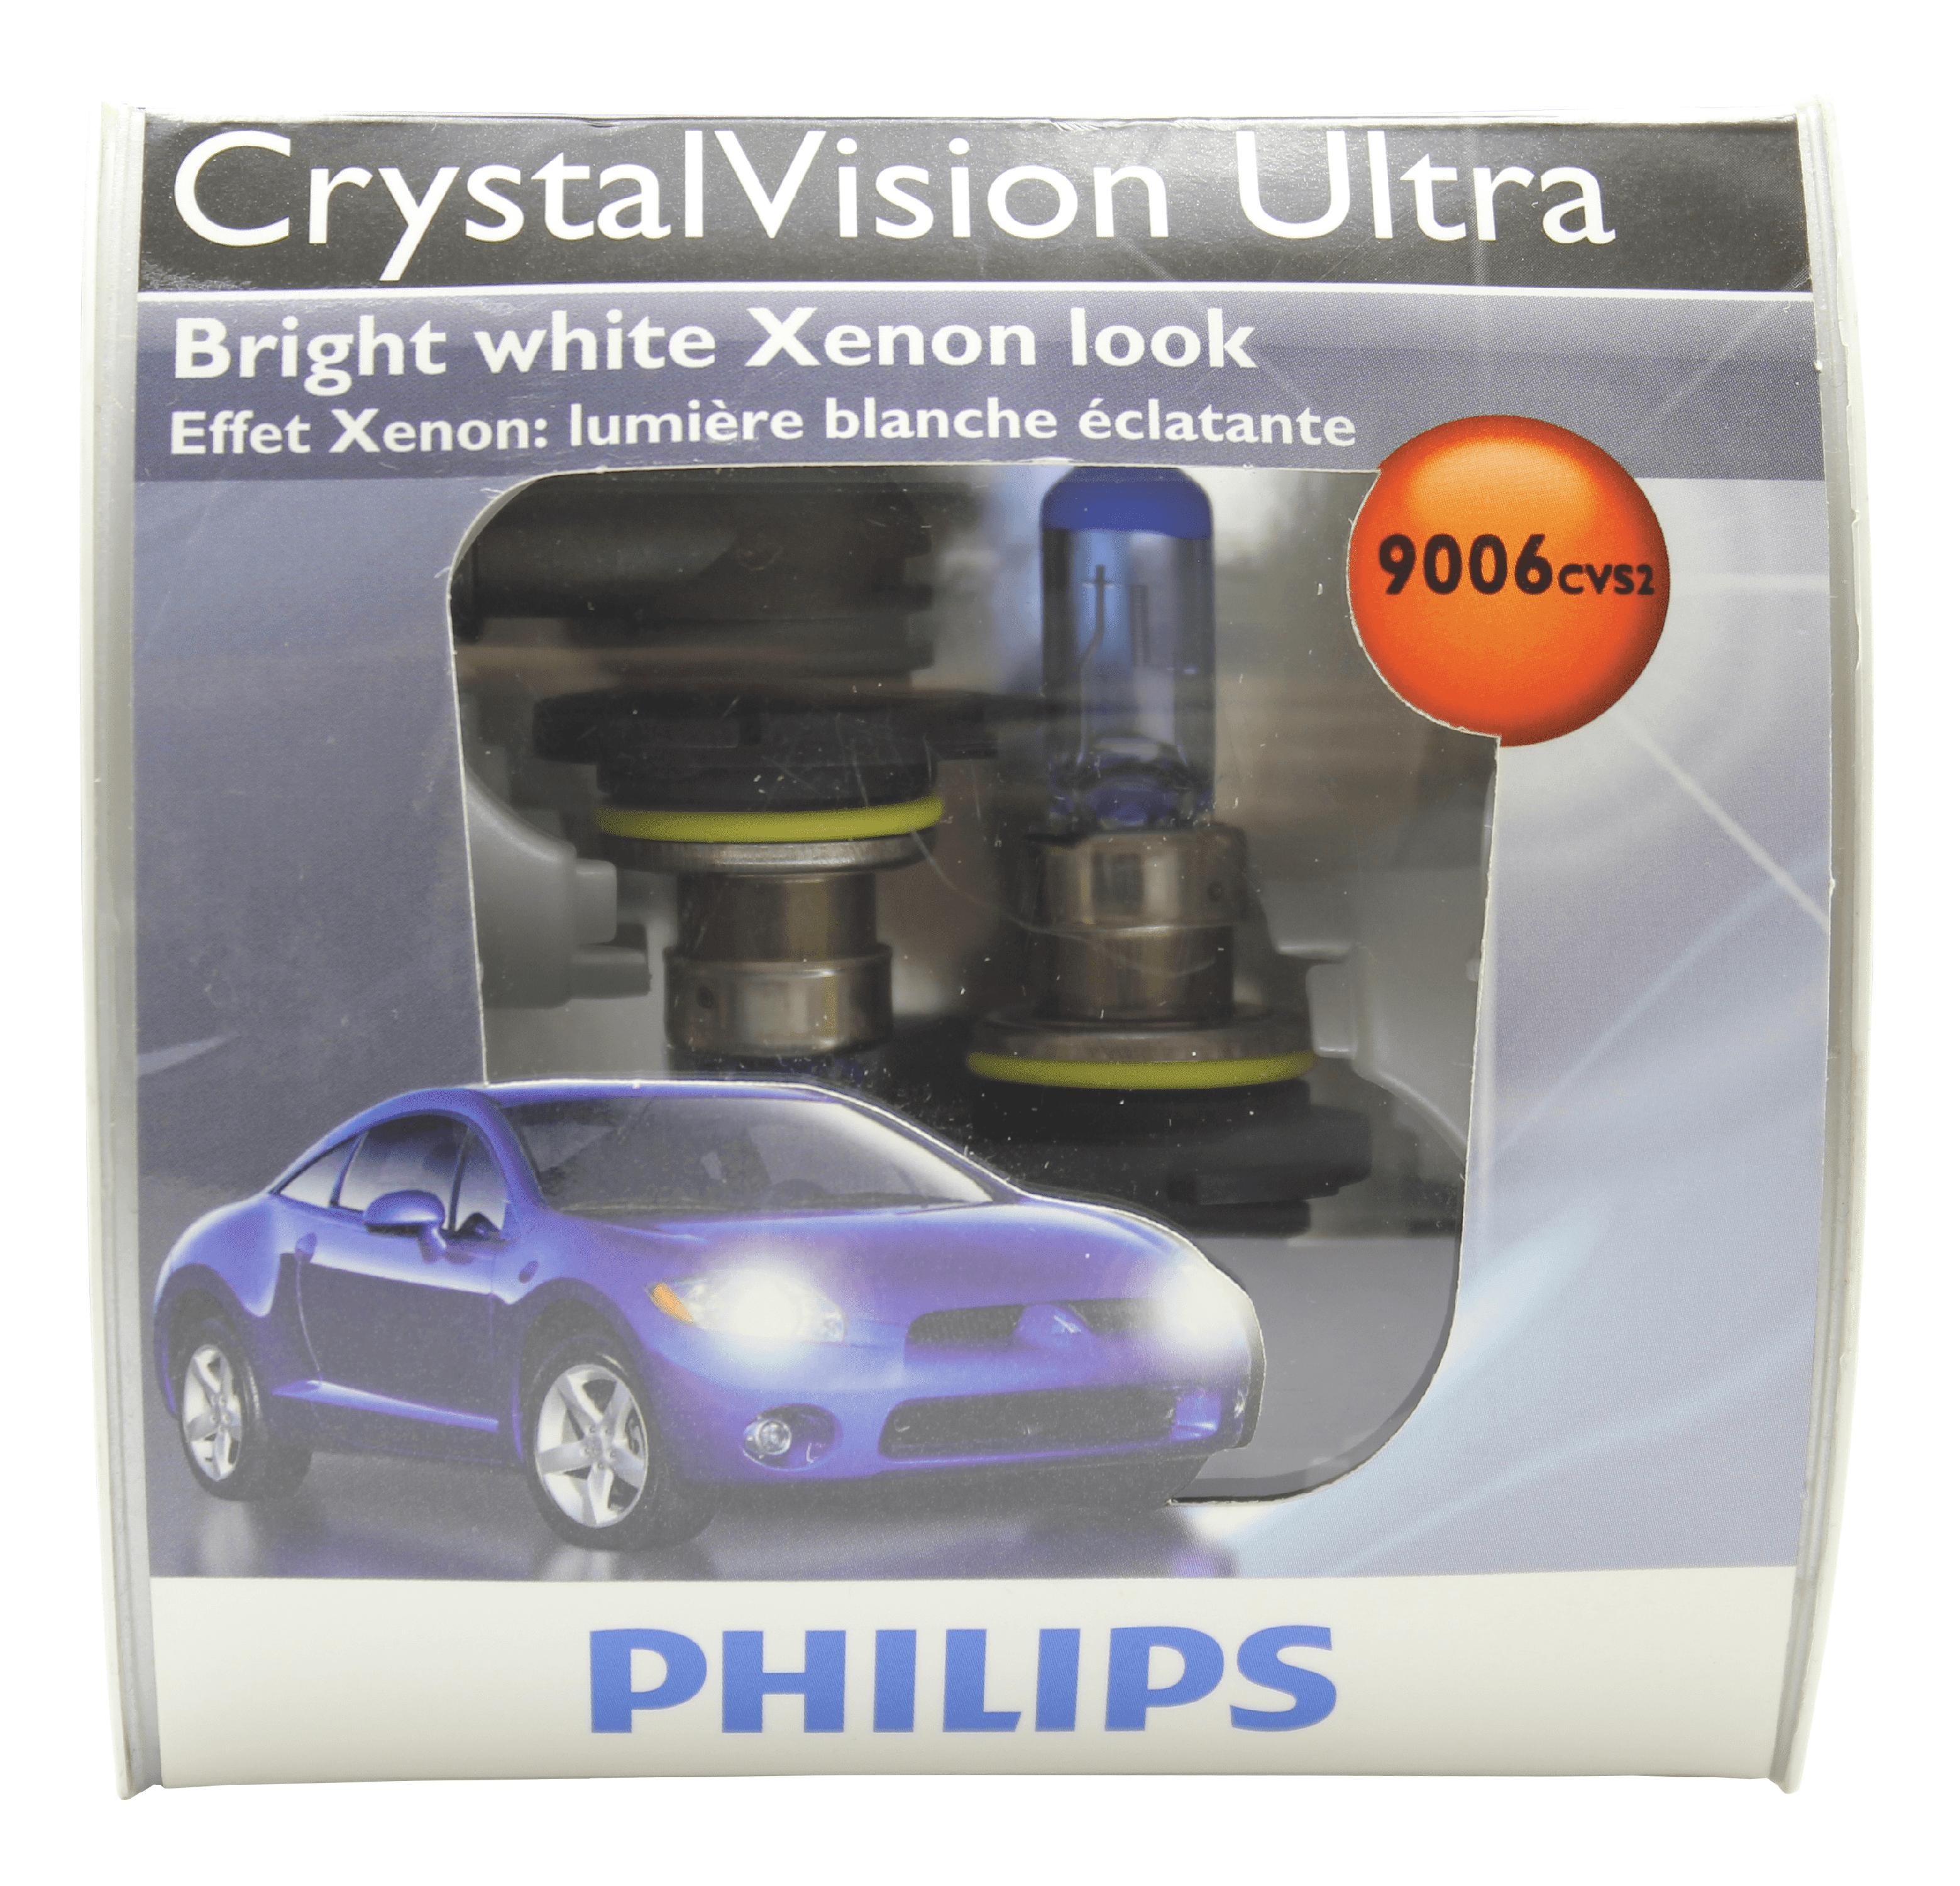 Philips 9006 HB4 - Blue Tint Crystal Vision Ultra Low Beam headlight - 2 Bulbs